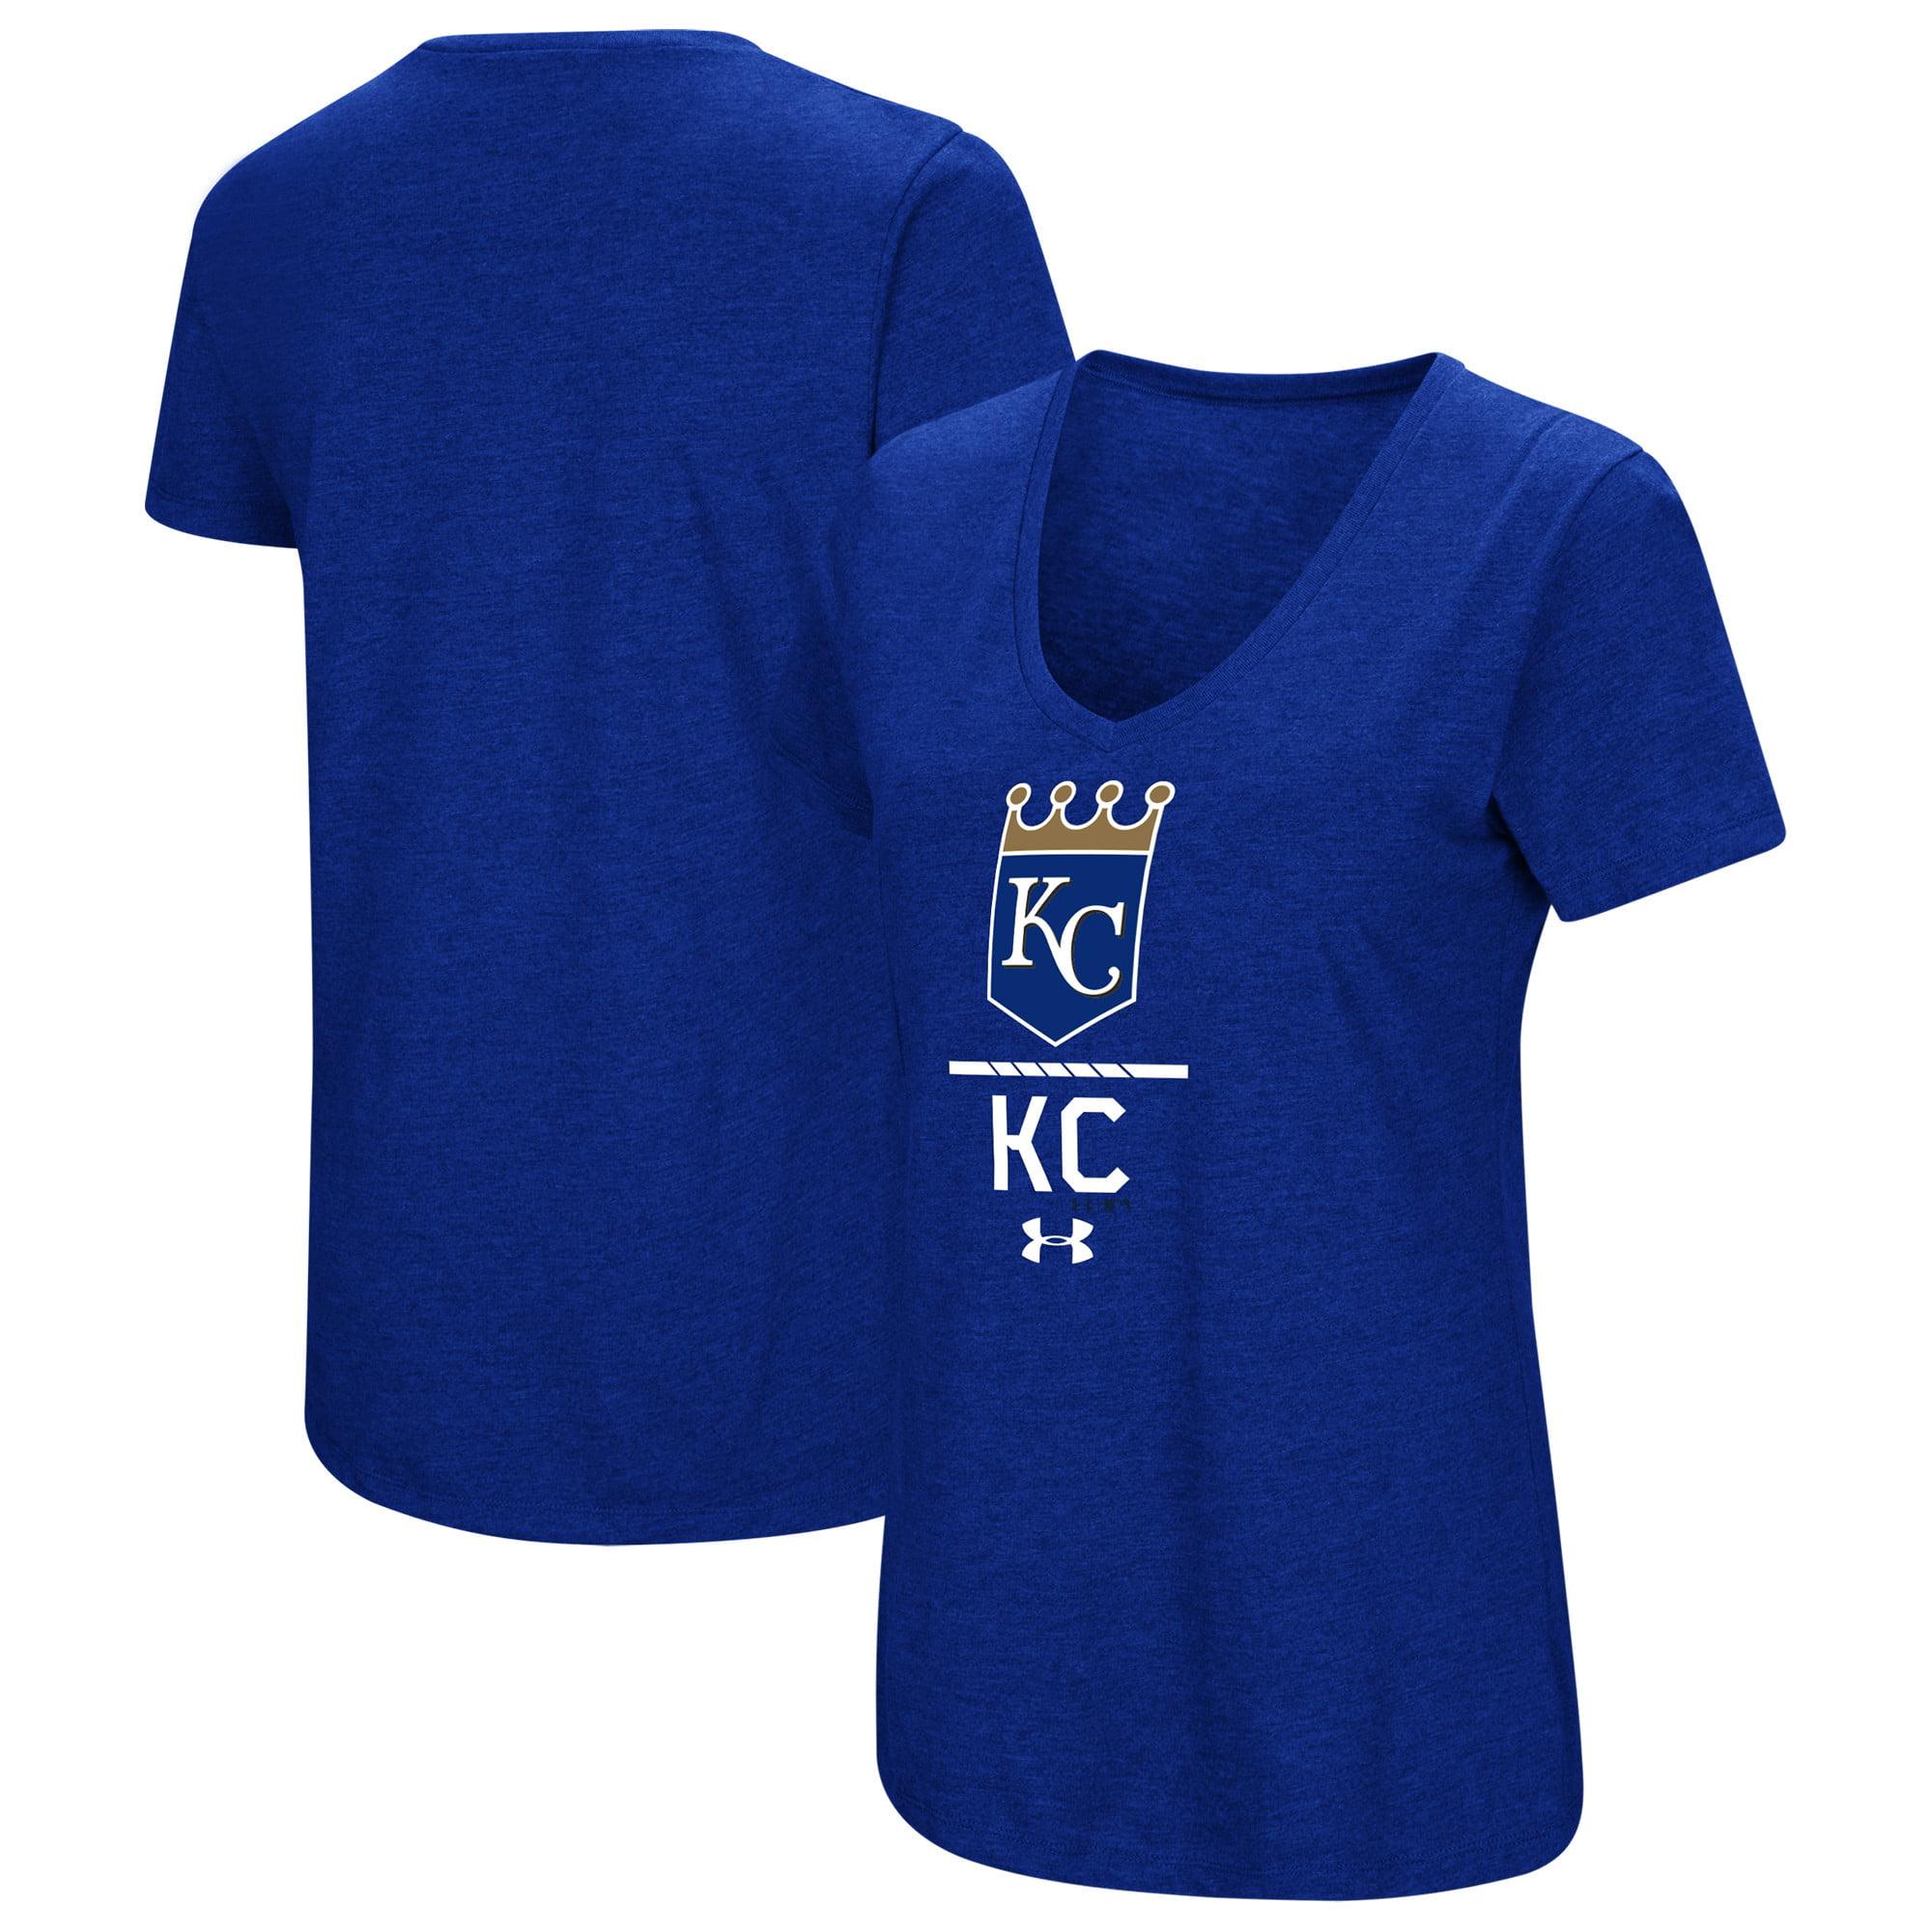 Kansas City Royals Under Armour Women's Team Lock-Up Tri-Blend T-Shirt - Royal